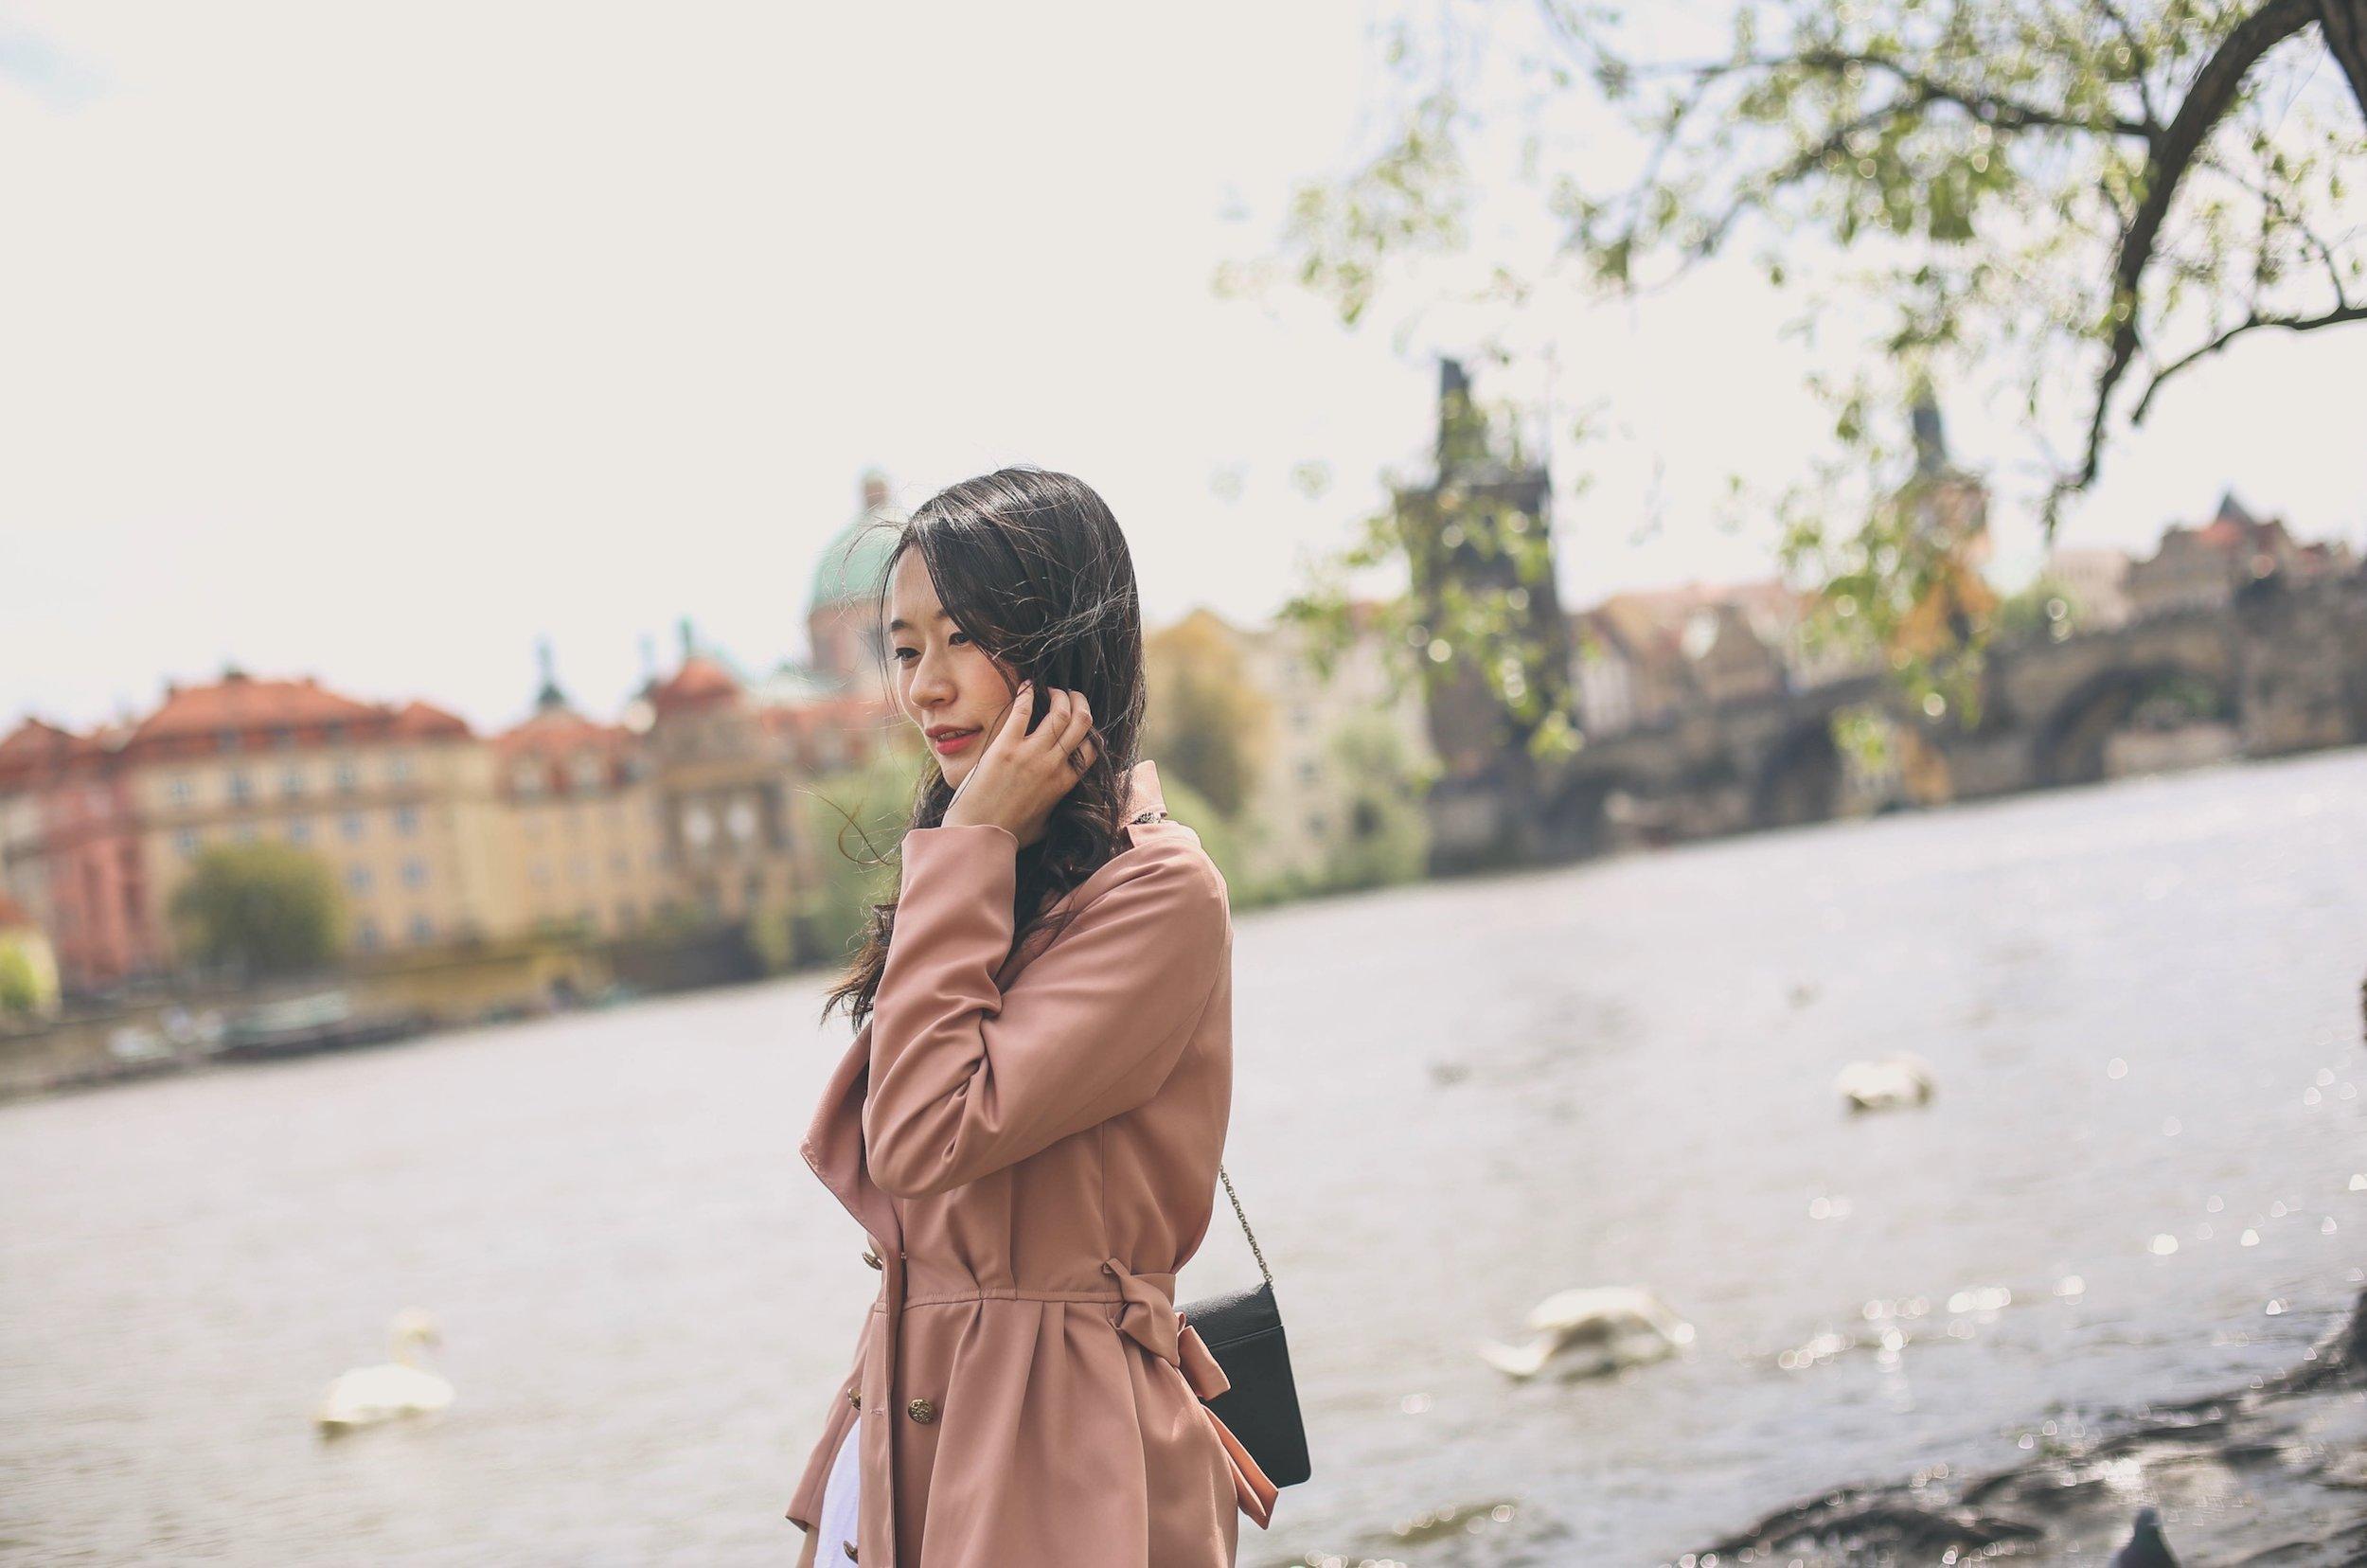 Sprazzi_Professional_Photography_Photographer_Prague_Czech-Republic_Irene_Original_11.jpg